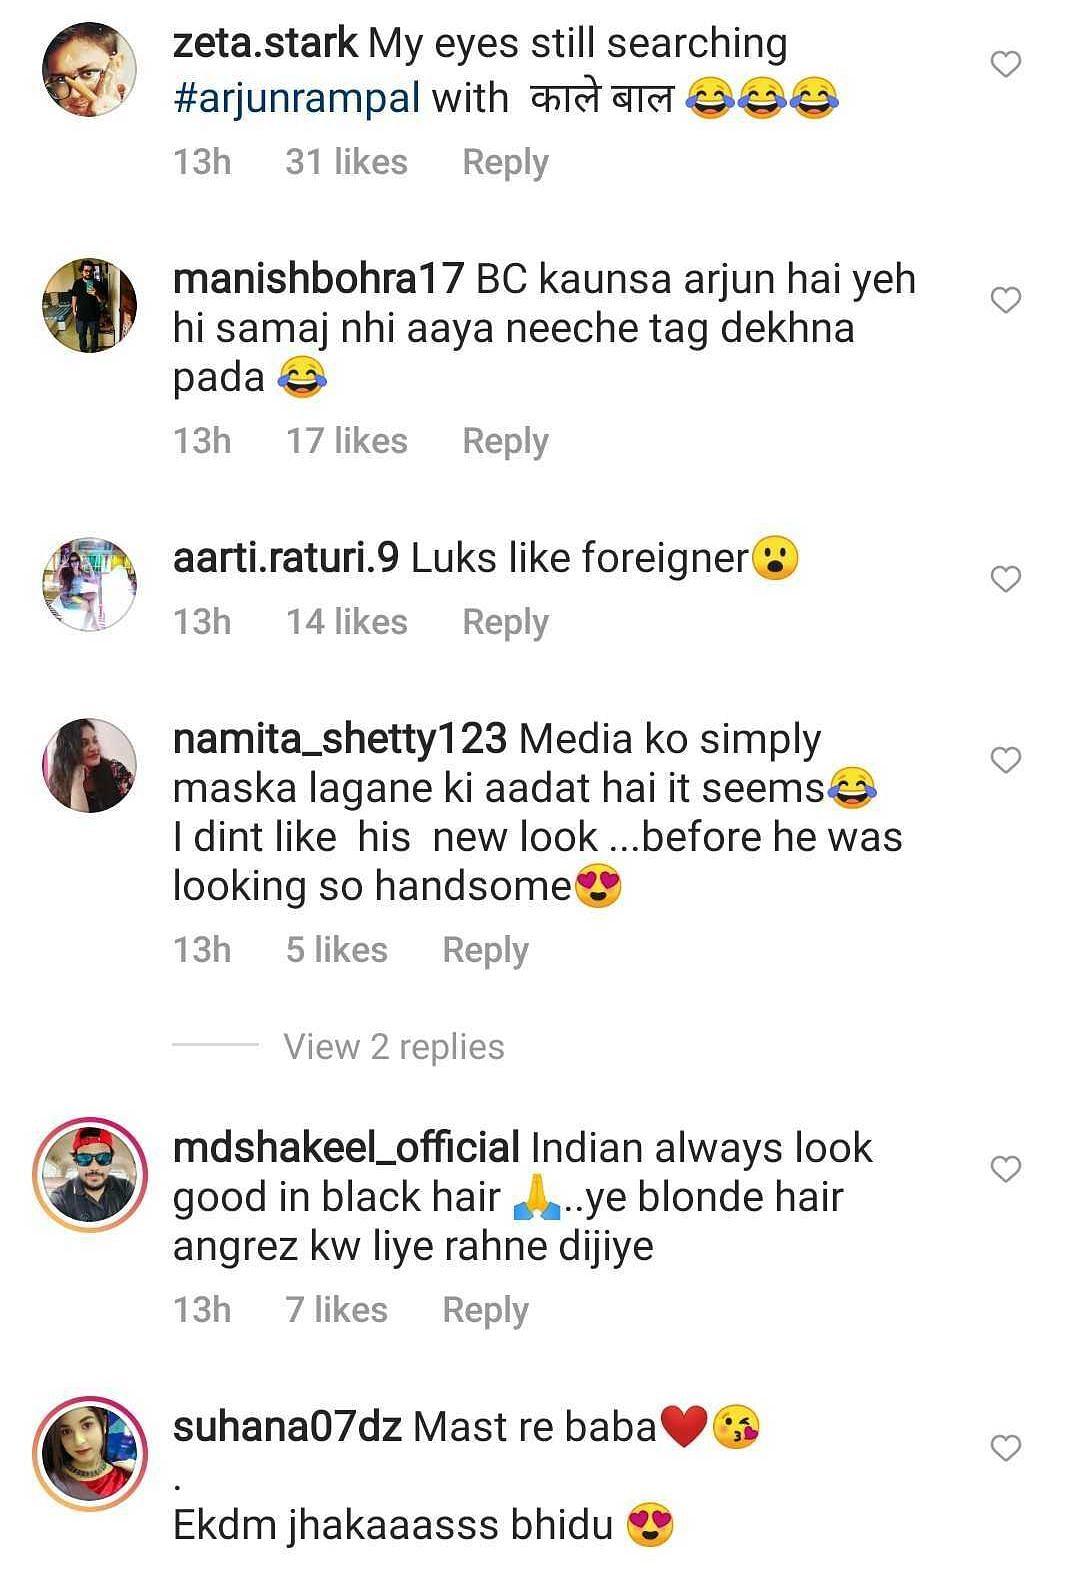 'Looks like Hollywood star': Netizens react to Arjun Rampal's platinum blonde hair - watch video